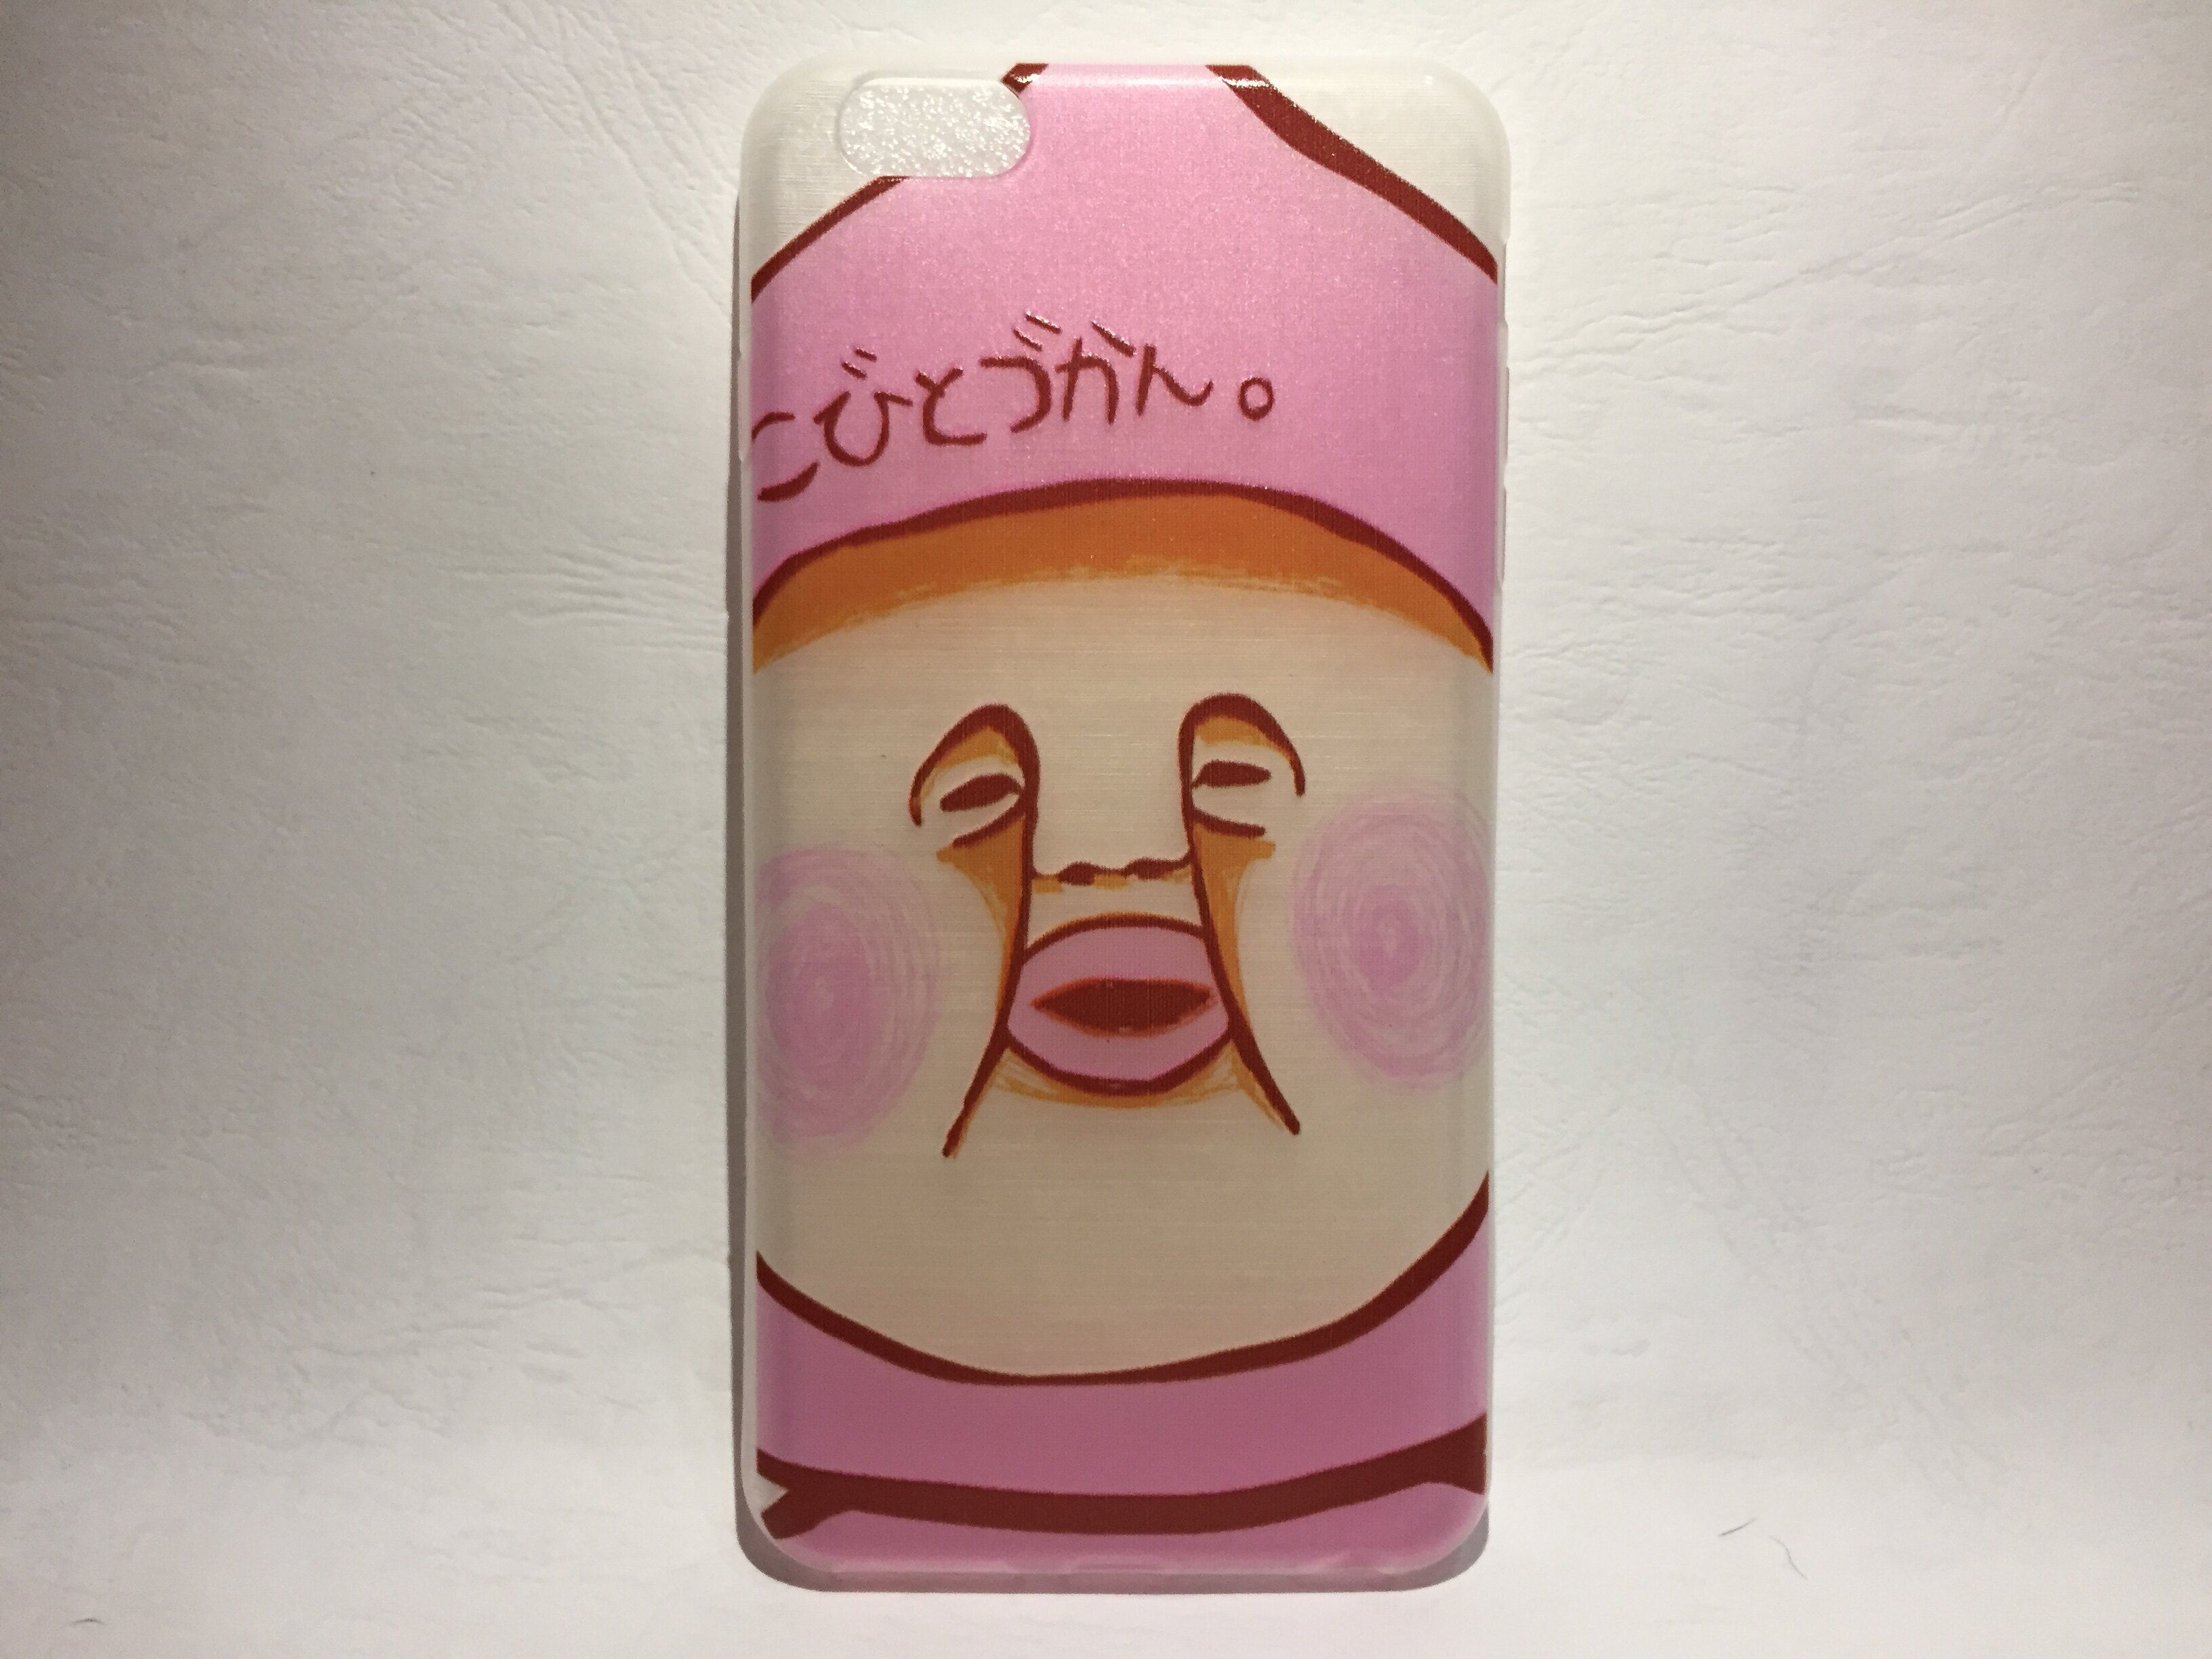 ELK 蘋果IPHONE6 PLUS/6S PLUS(5.5吋) 屁桃 胖桃子 農場精靈  手機殼 保護套 - 限時優惠好康折扣